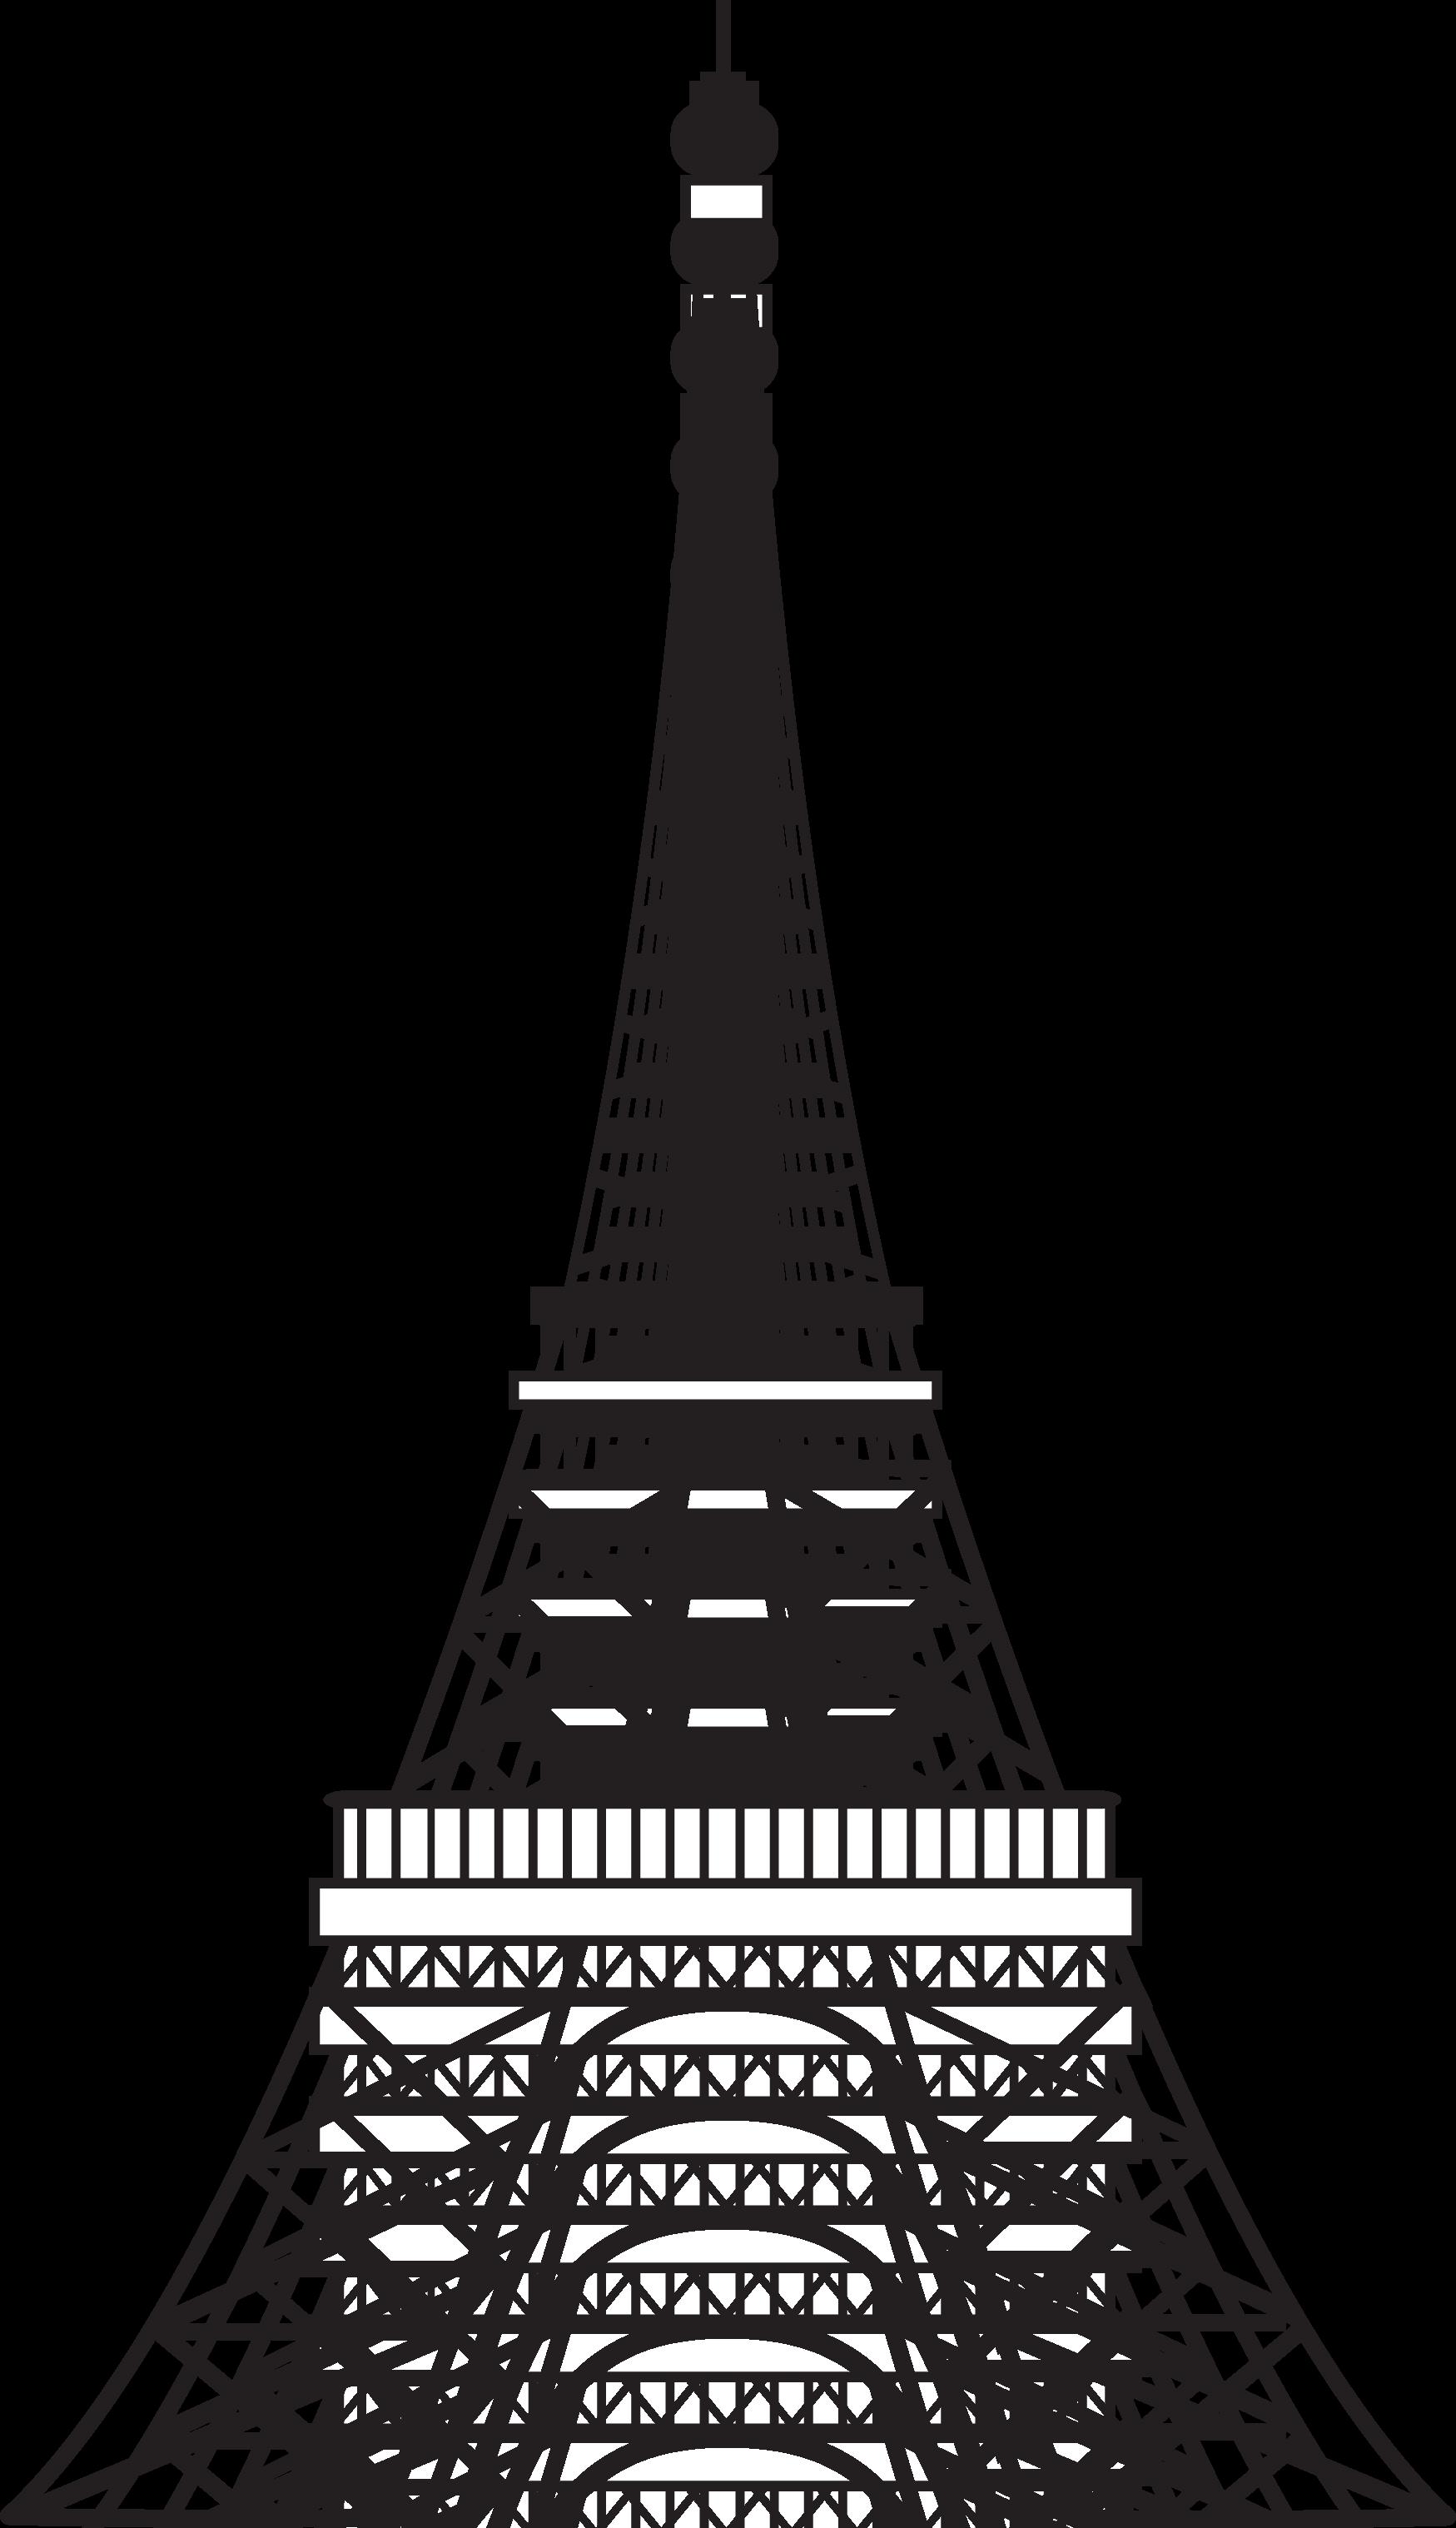 Paris eiffel tower drawing cakepins cake creations pinterest paris eiffel tower drawing cakepins thecheapjerseys Gallery